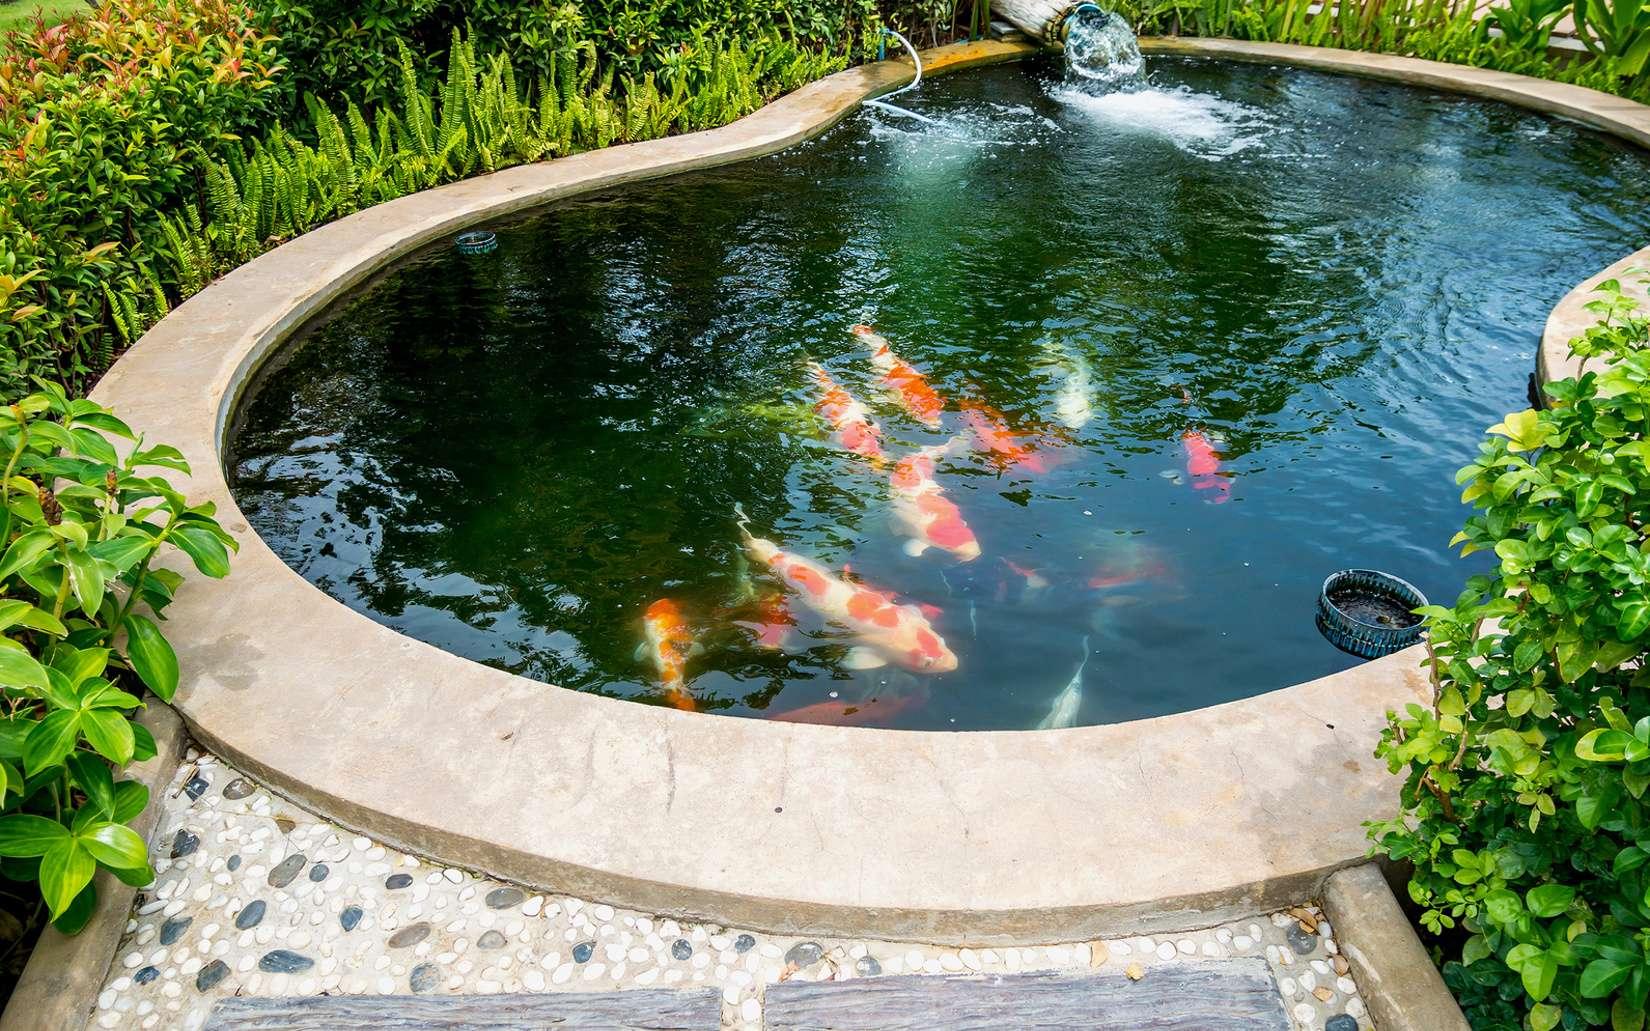 Bassin Fontaine De Jardin fontaine et bassin – garden aménagement